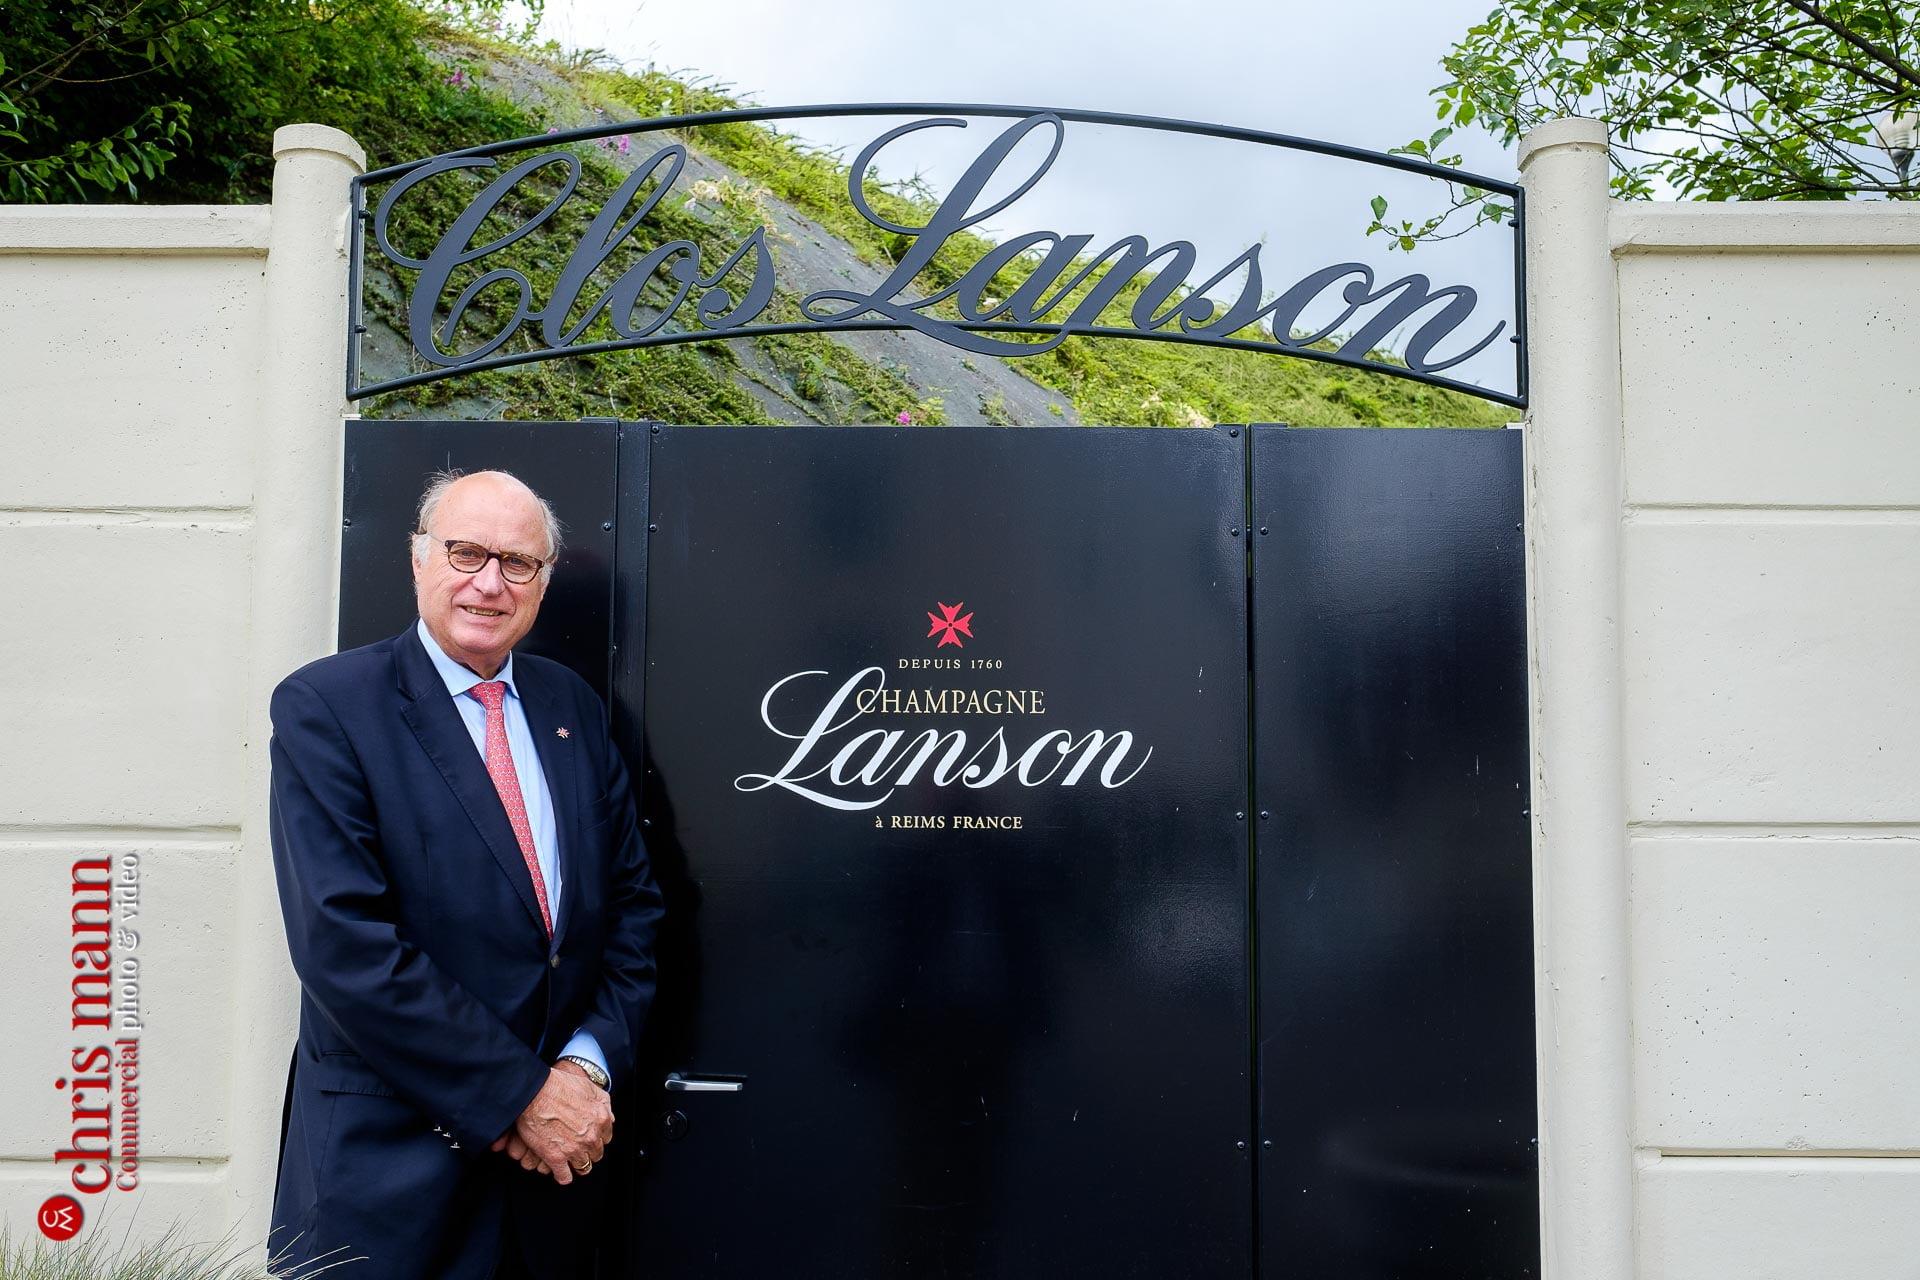 Lanson CEO Philippe Baijot